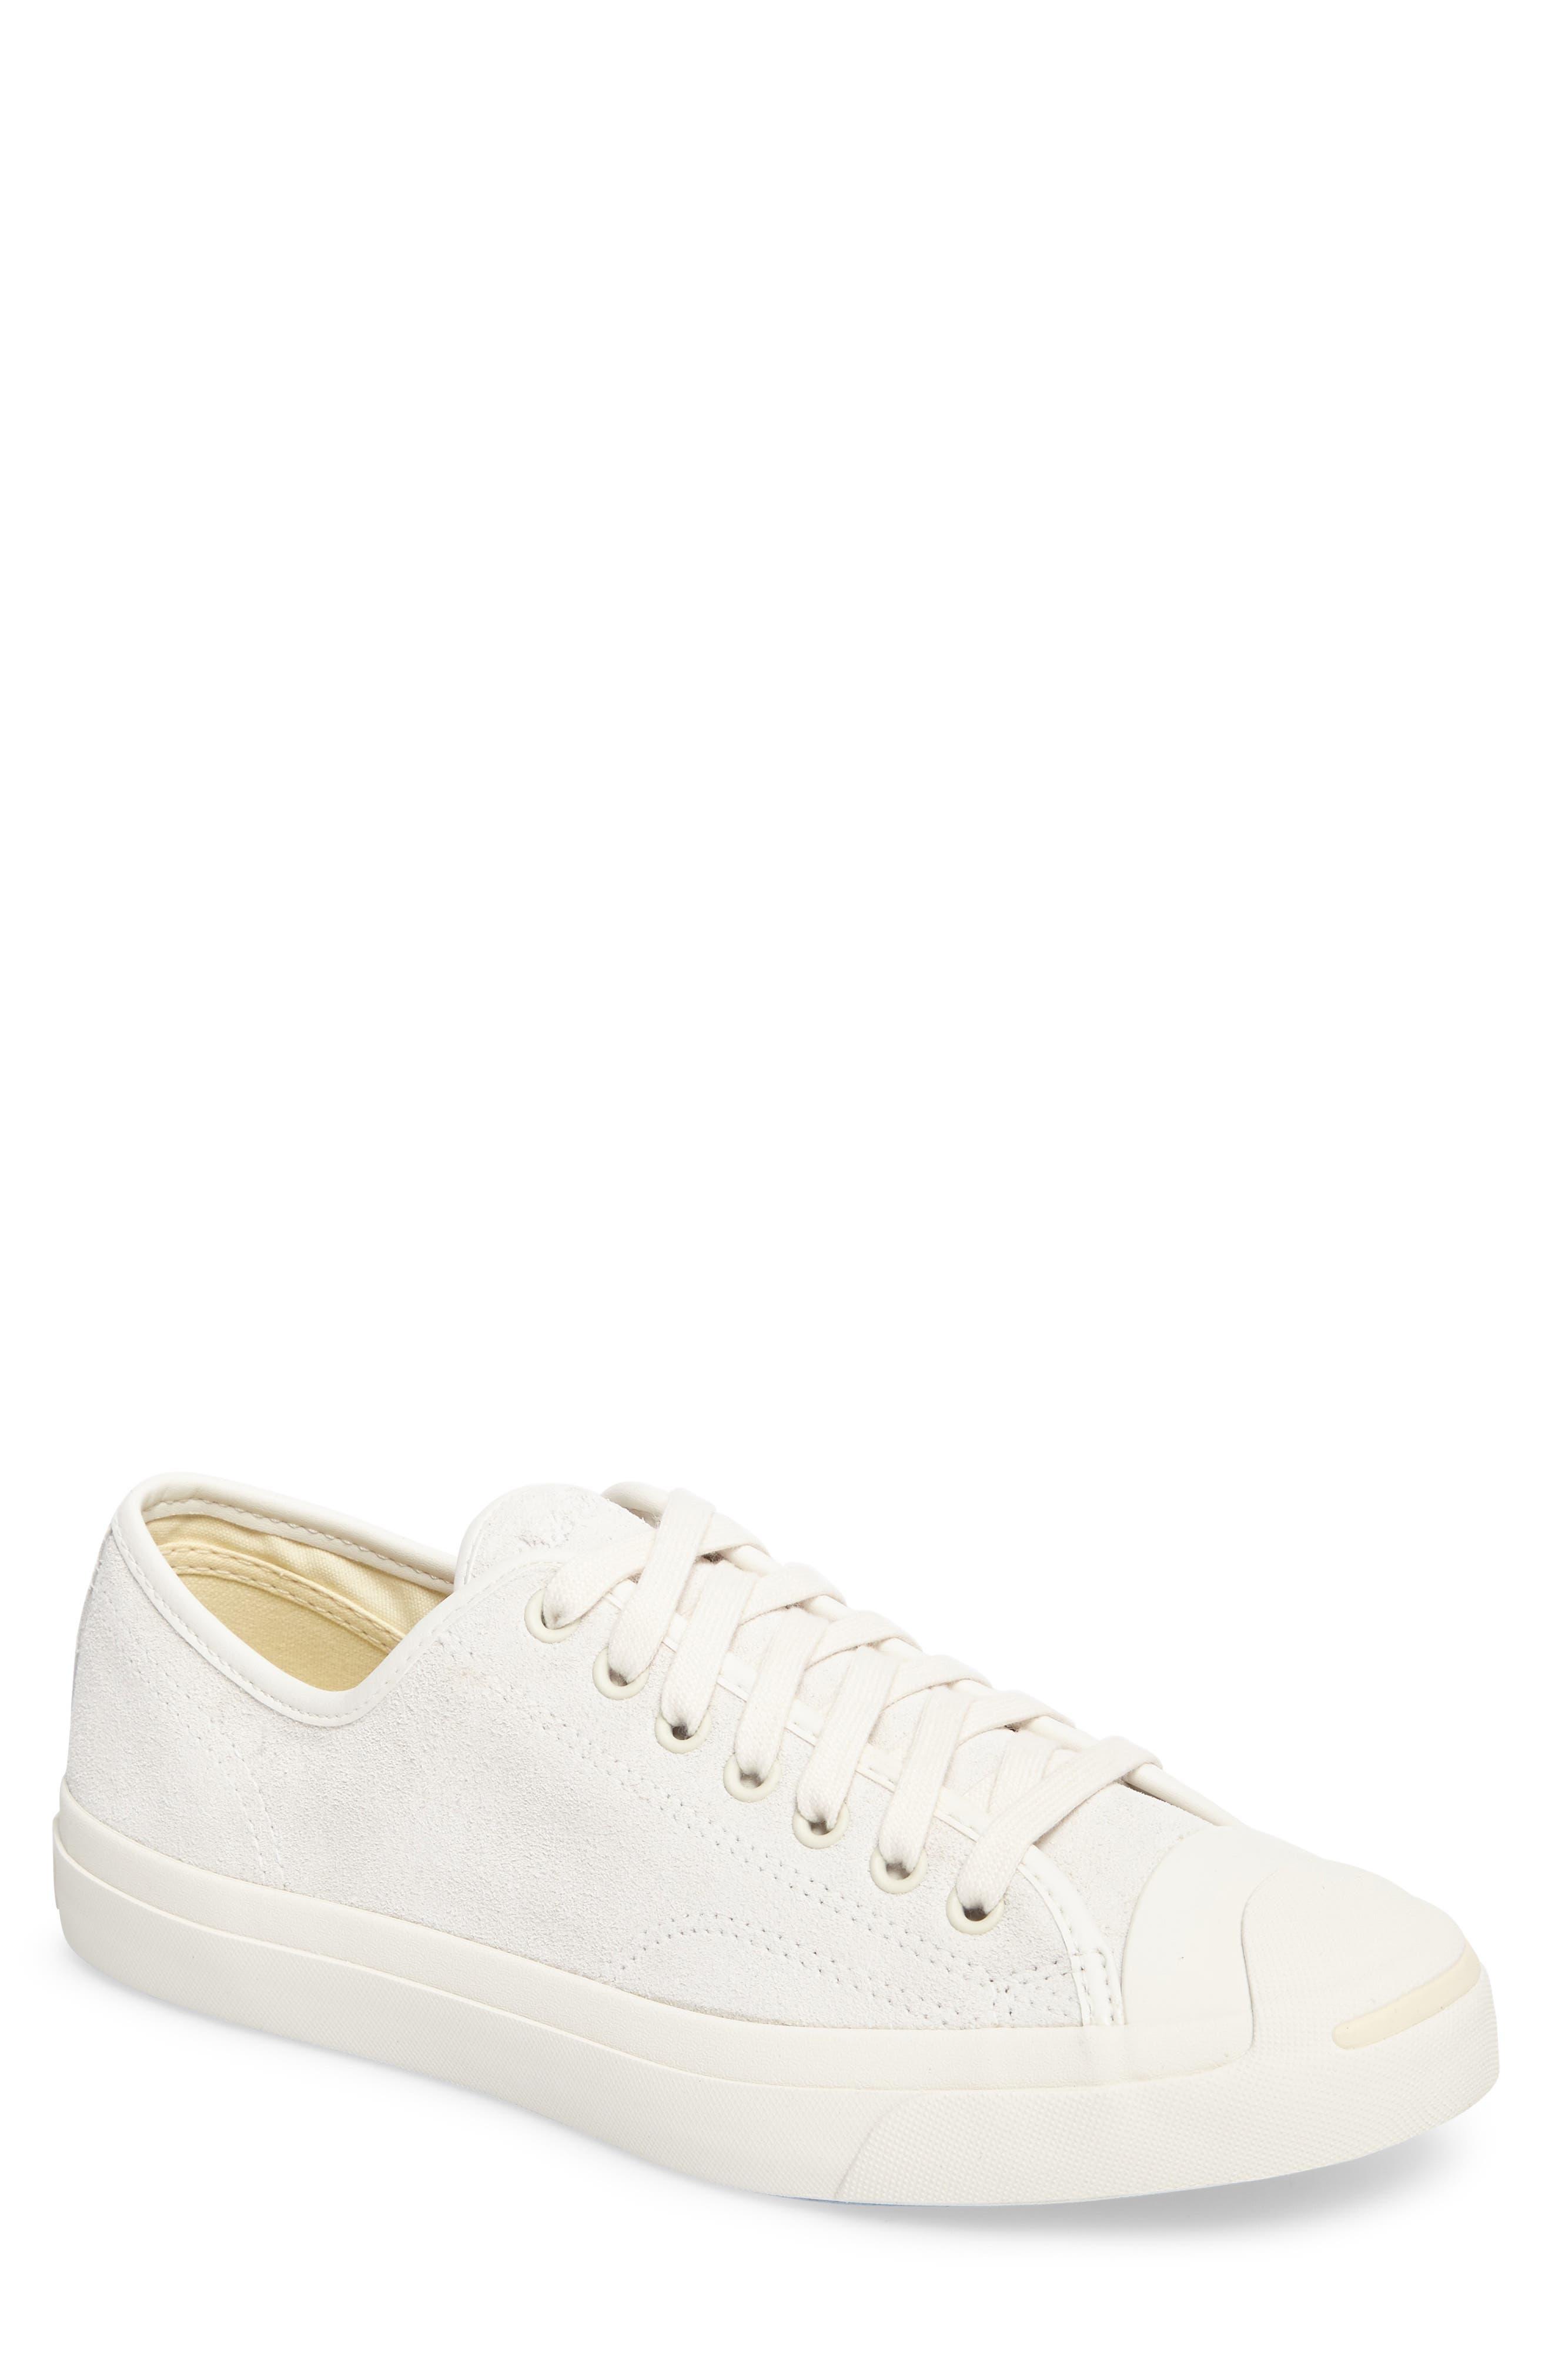 Converse Jack Purcell Sneaker (Men)